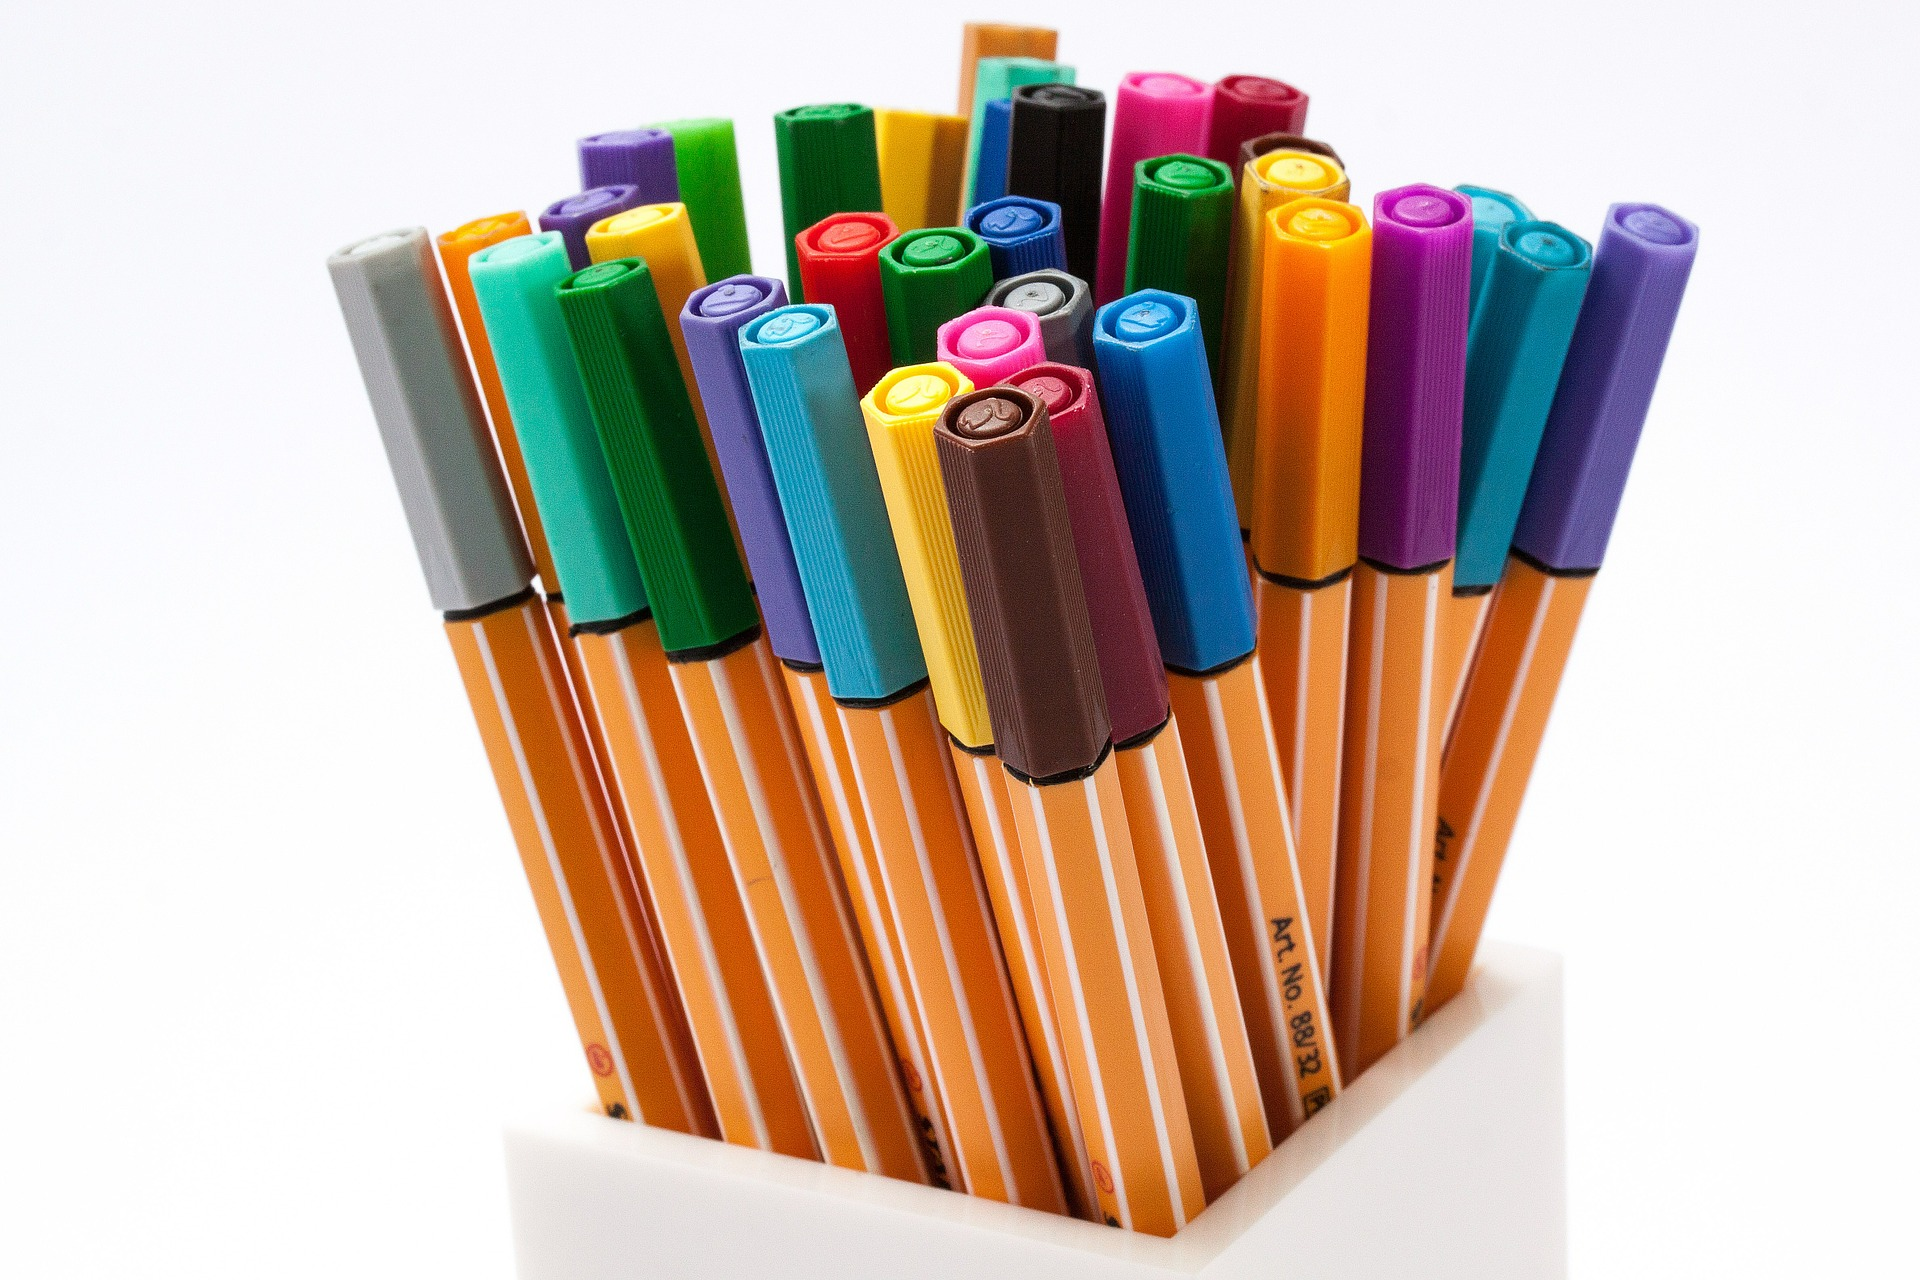 stylo couleur boite note